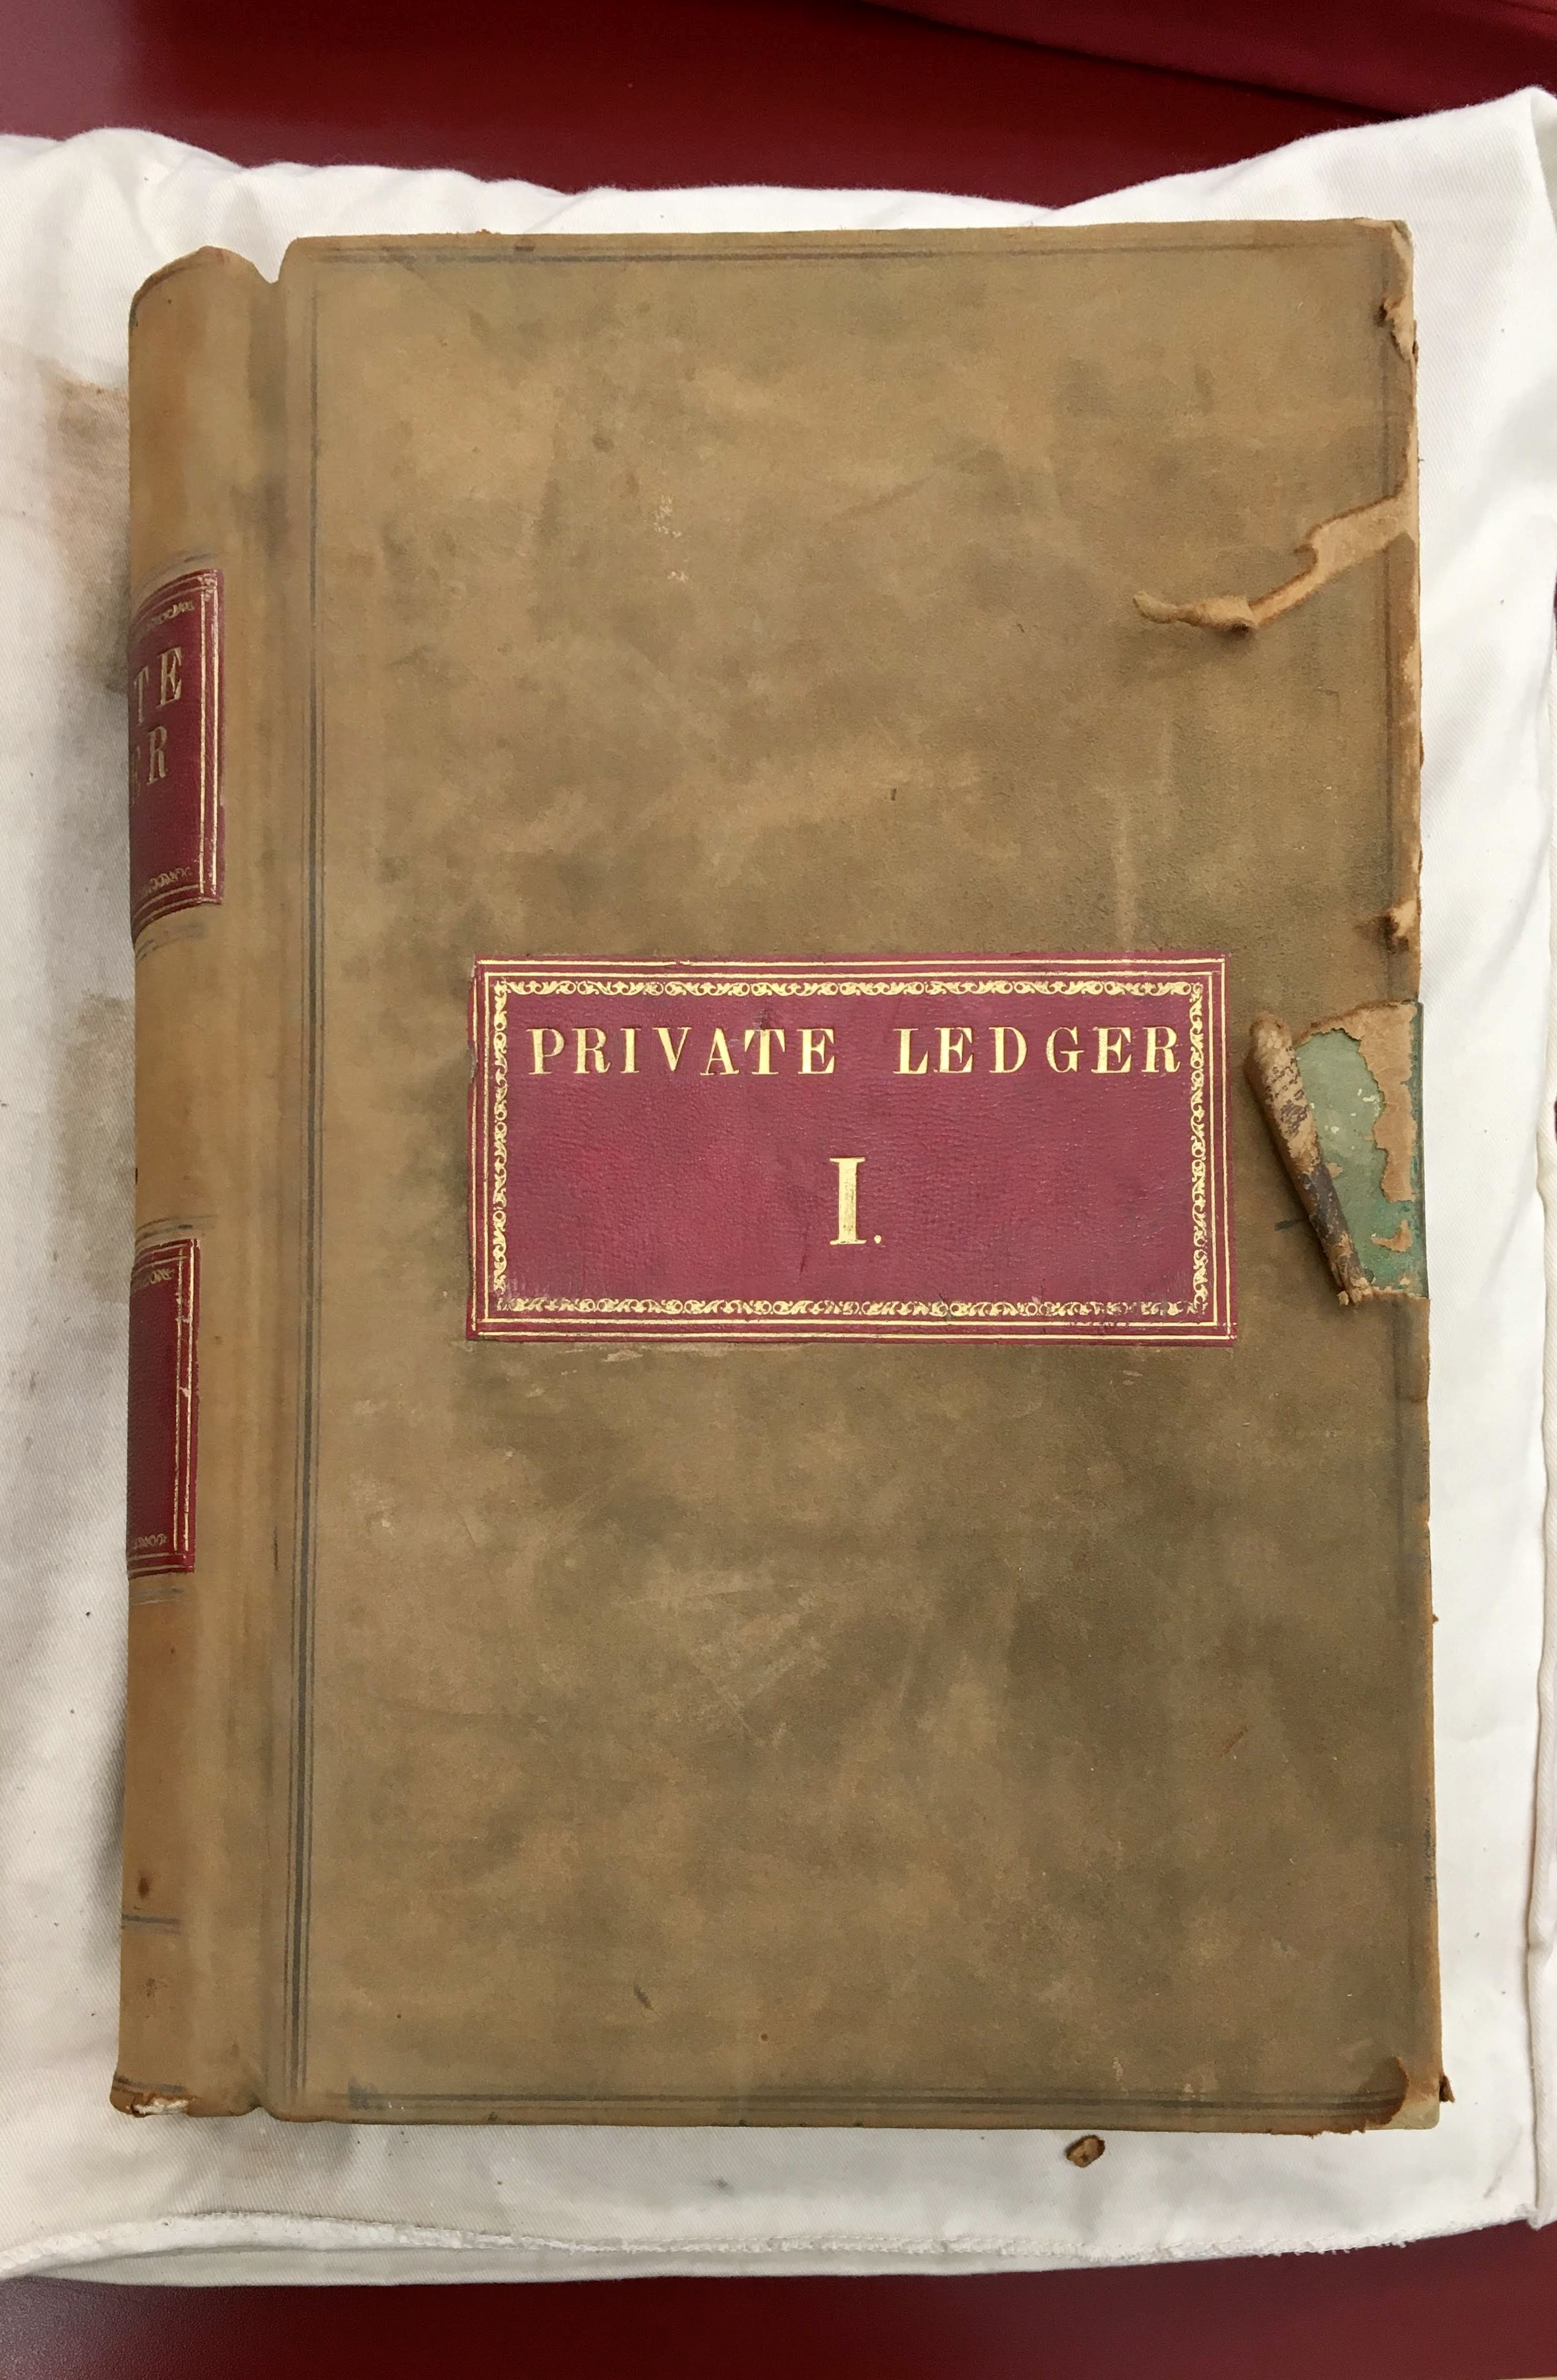 Private ledger